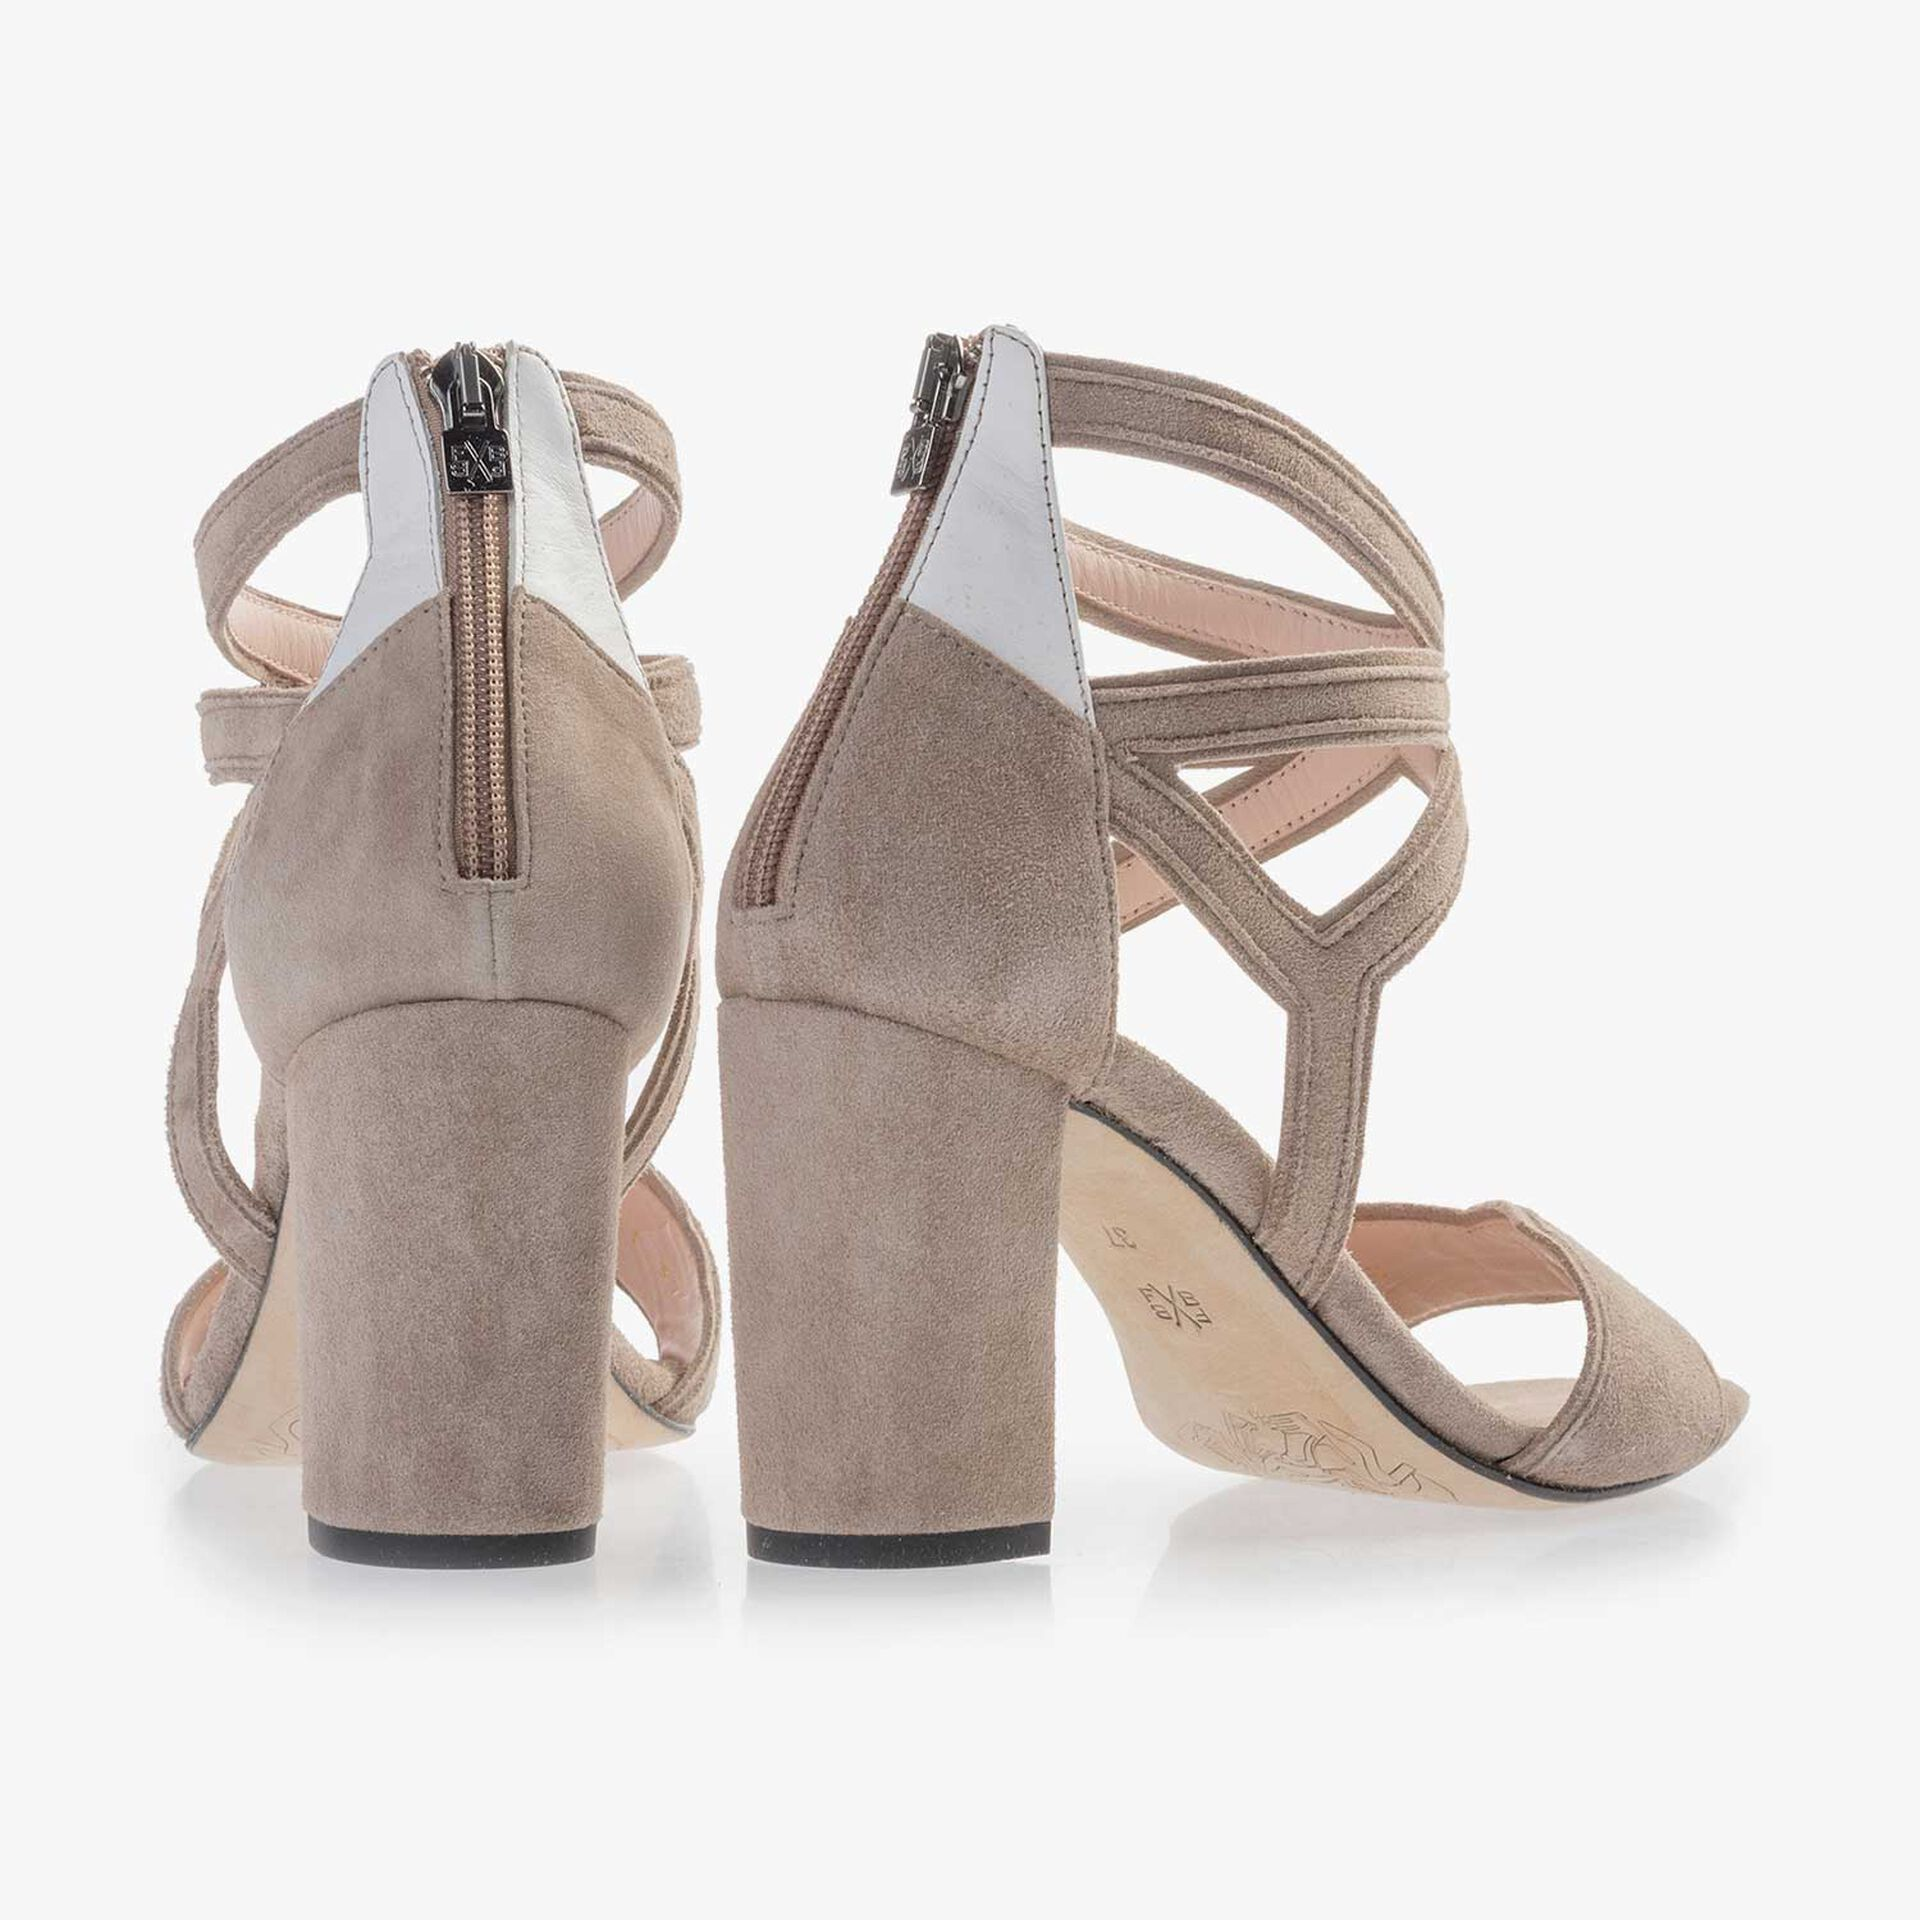 Taupekleurige kalfssuède sandaal met hak